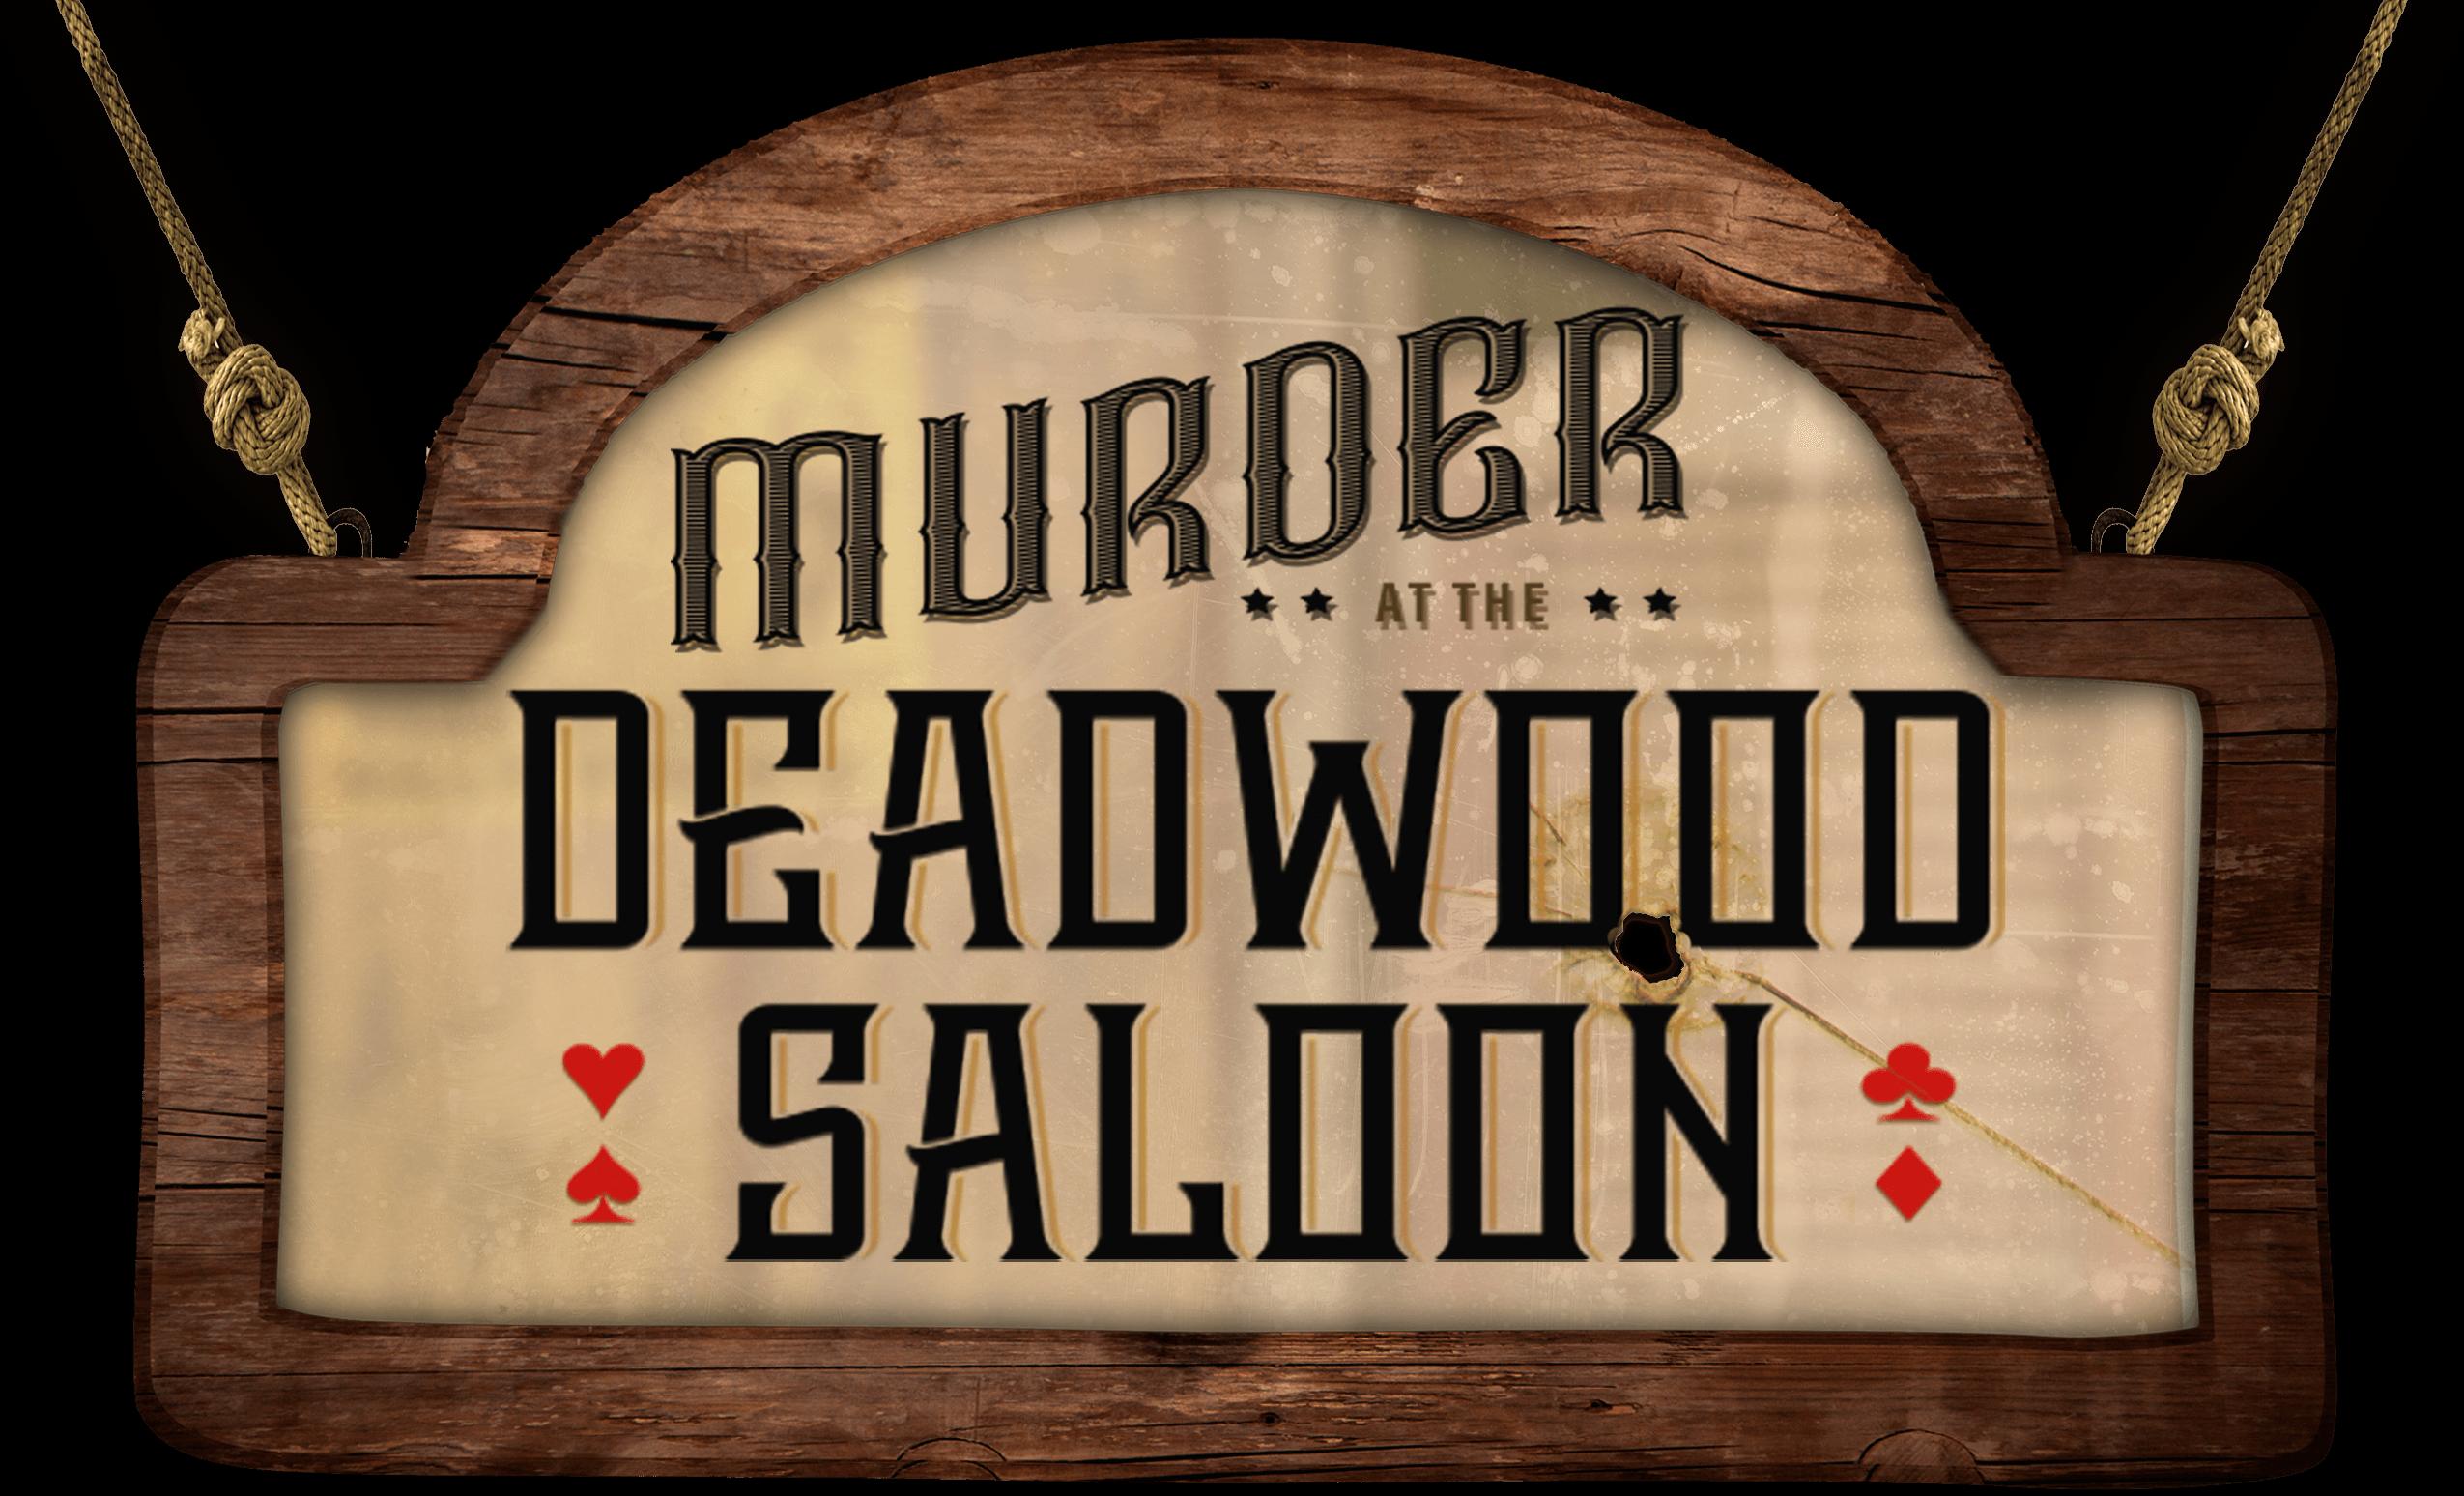 murder at the deadwood saloon logo sign